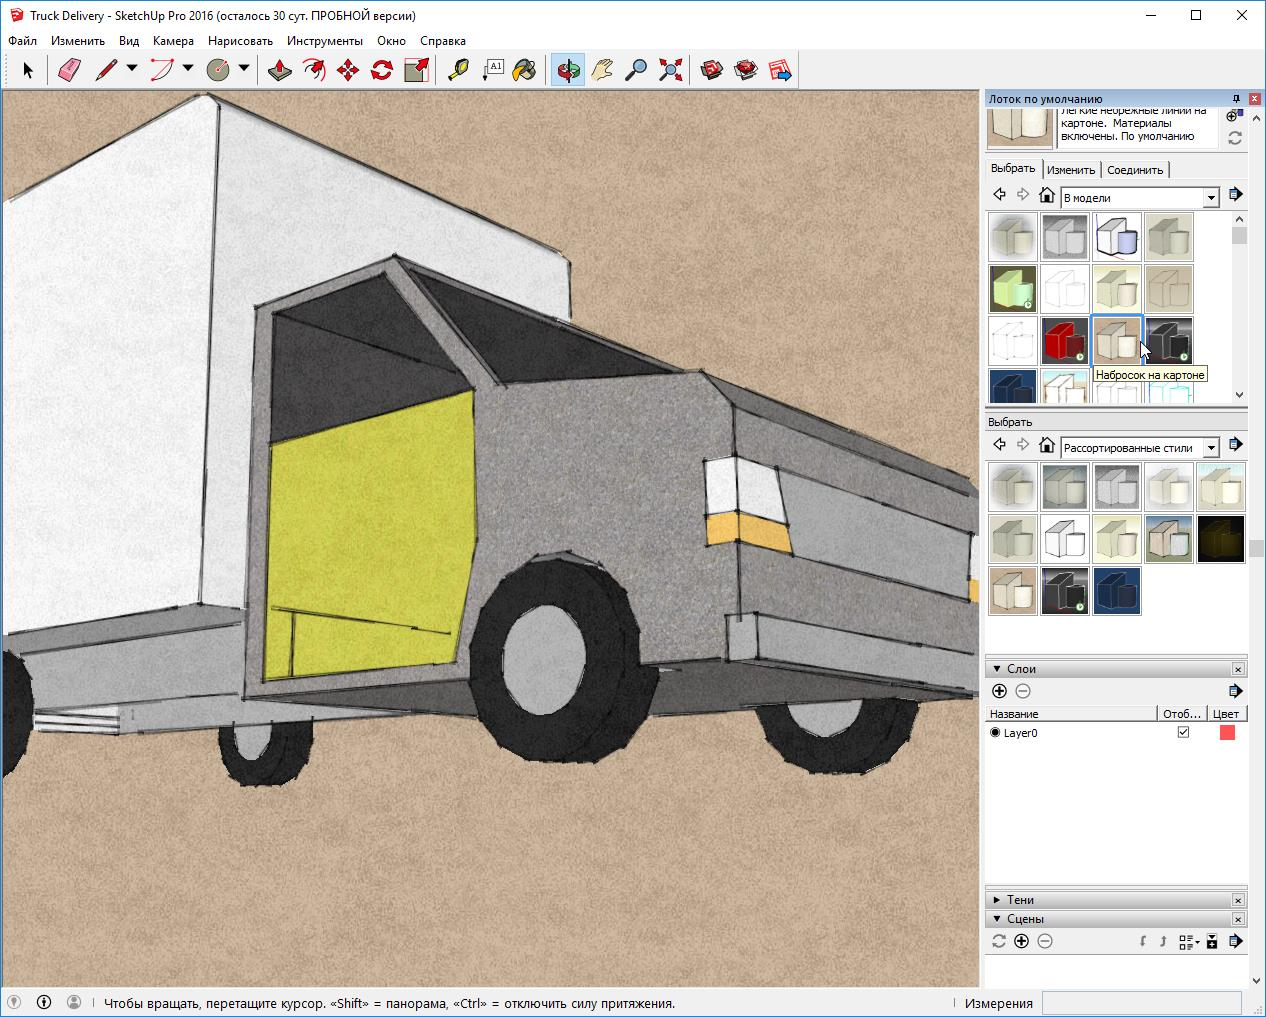 dlya-kompyutera-google-sketchup